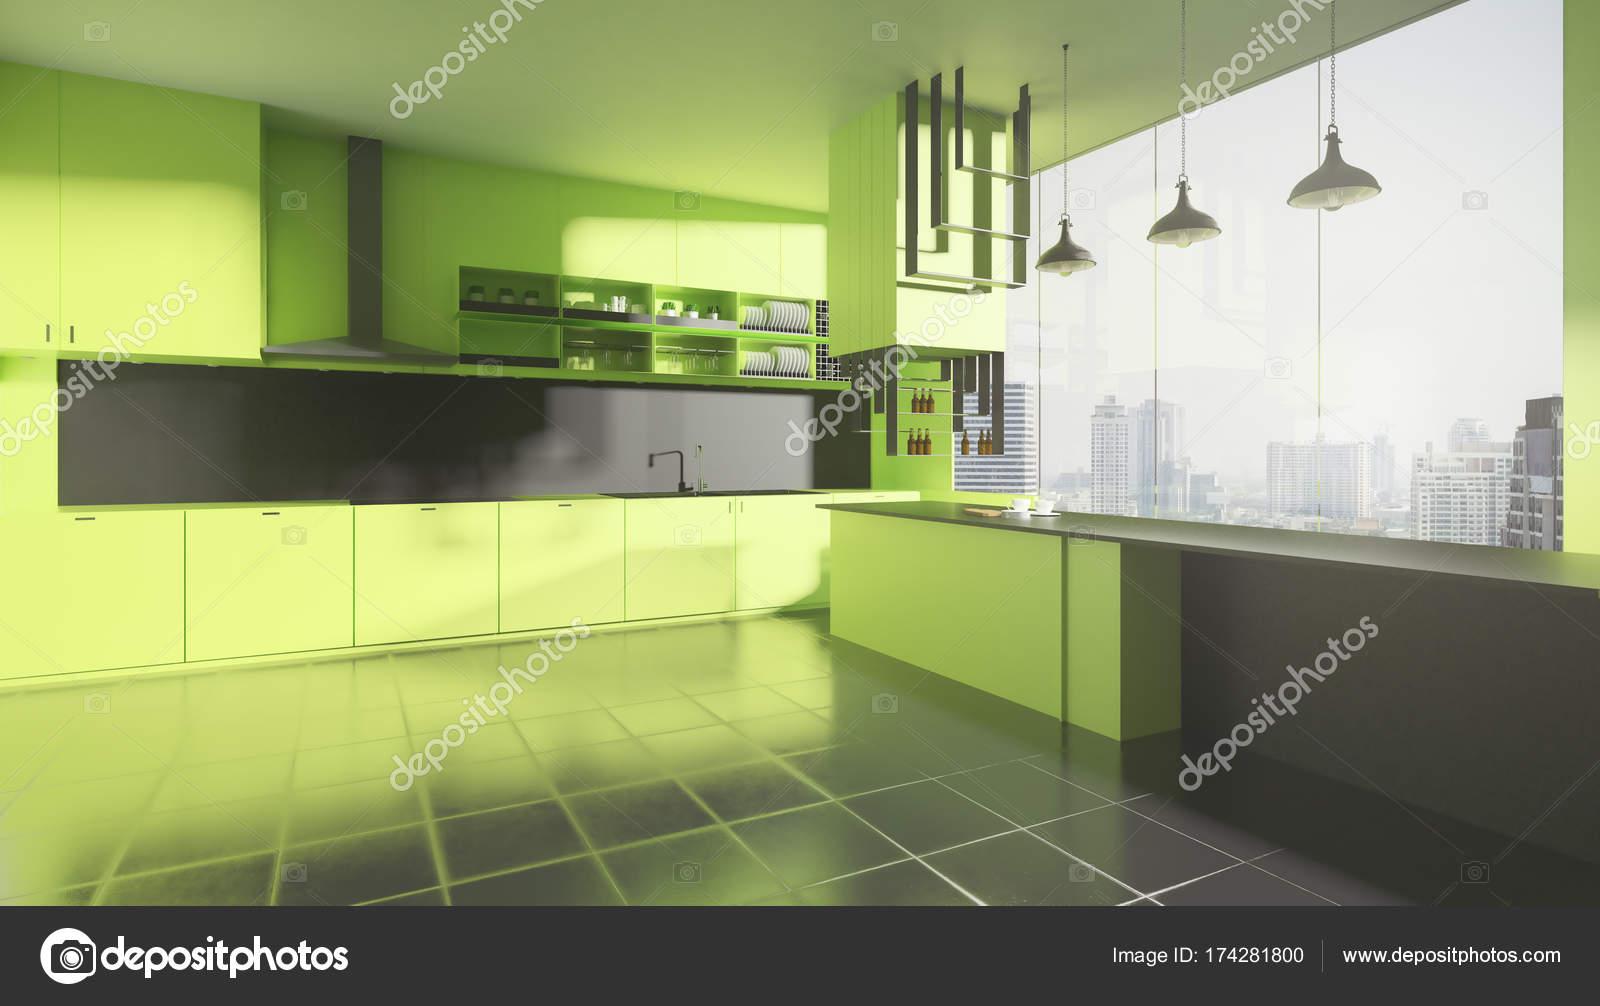 Interni Moderni Cucine : Interni moderni cucina verde u2014 foto stock © peshkov #174281800